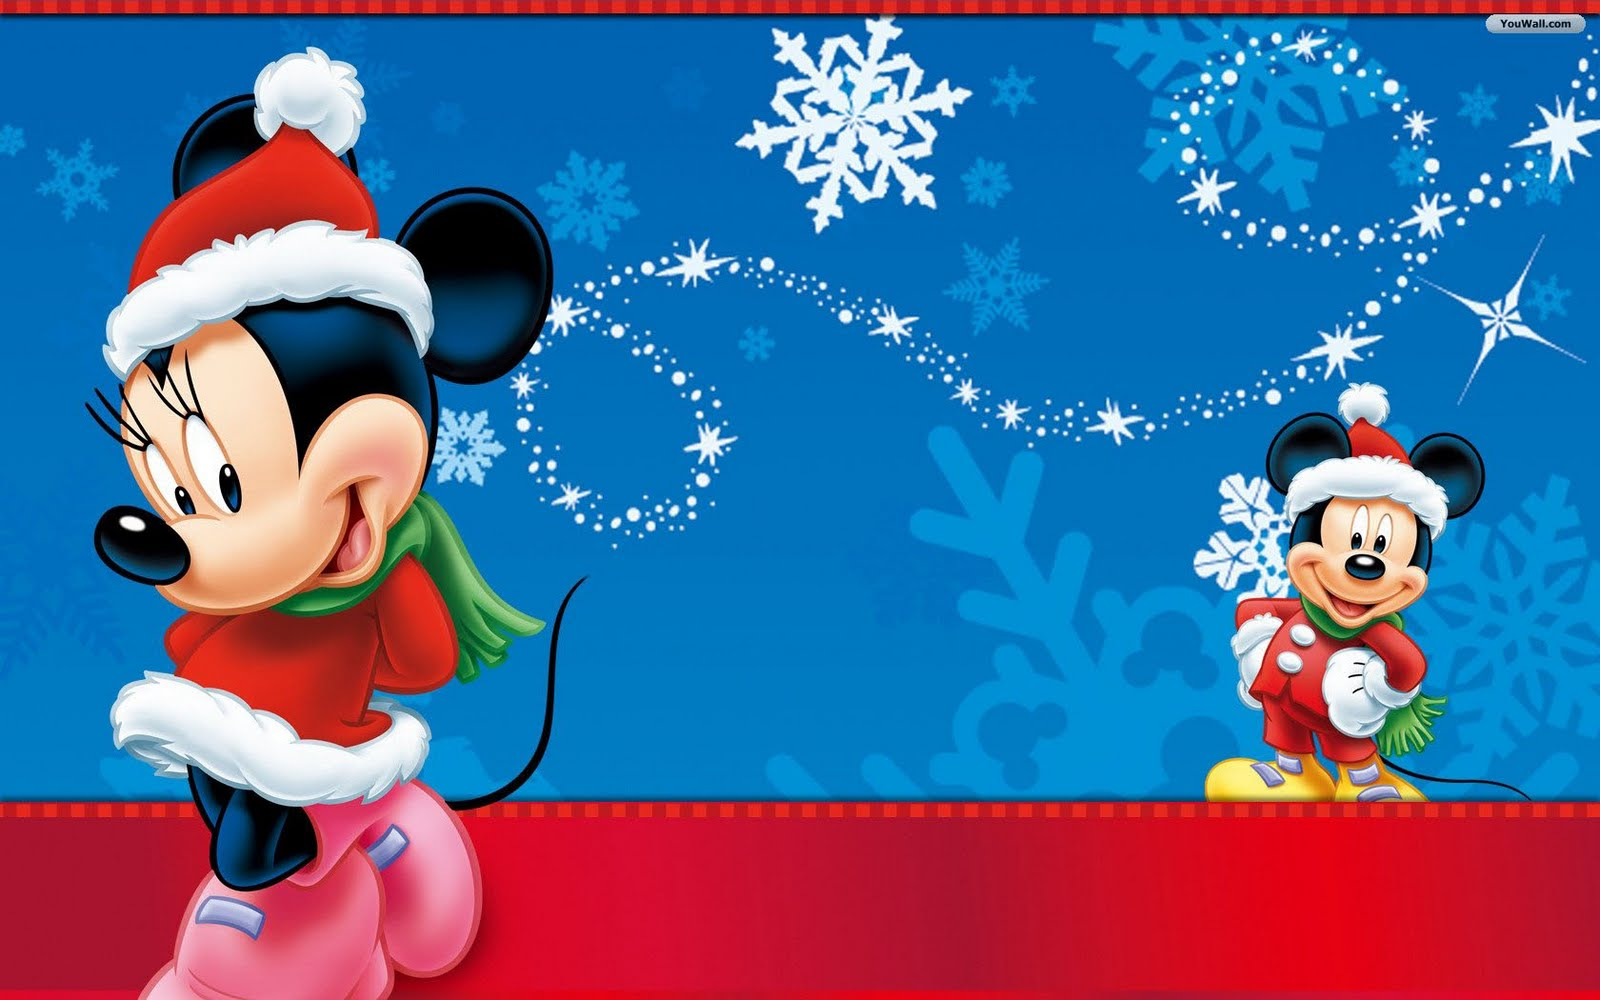 Kid at Christmas: 5 adorable Disney Christmas wallpapers for your ...